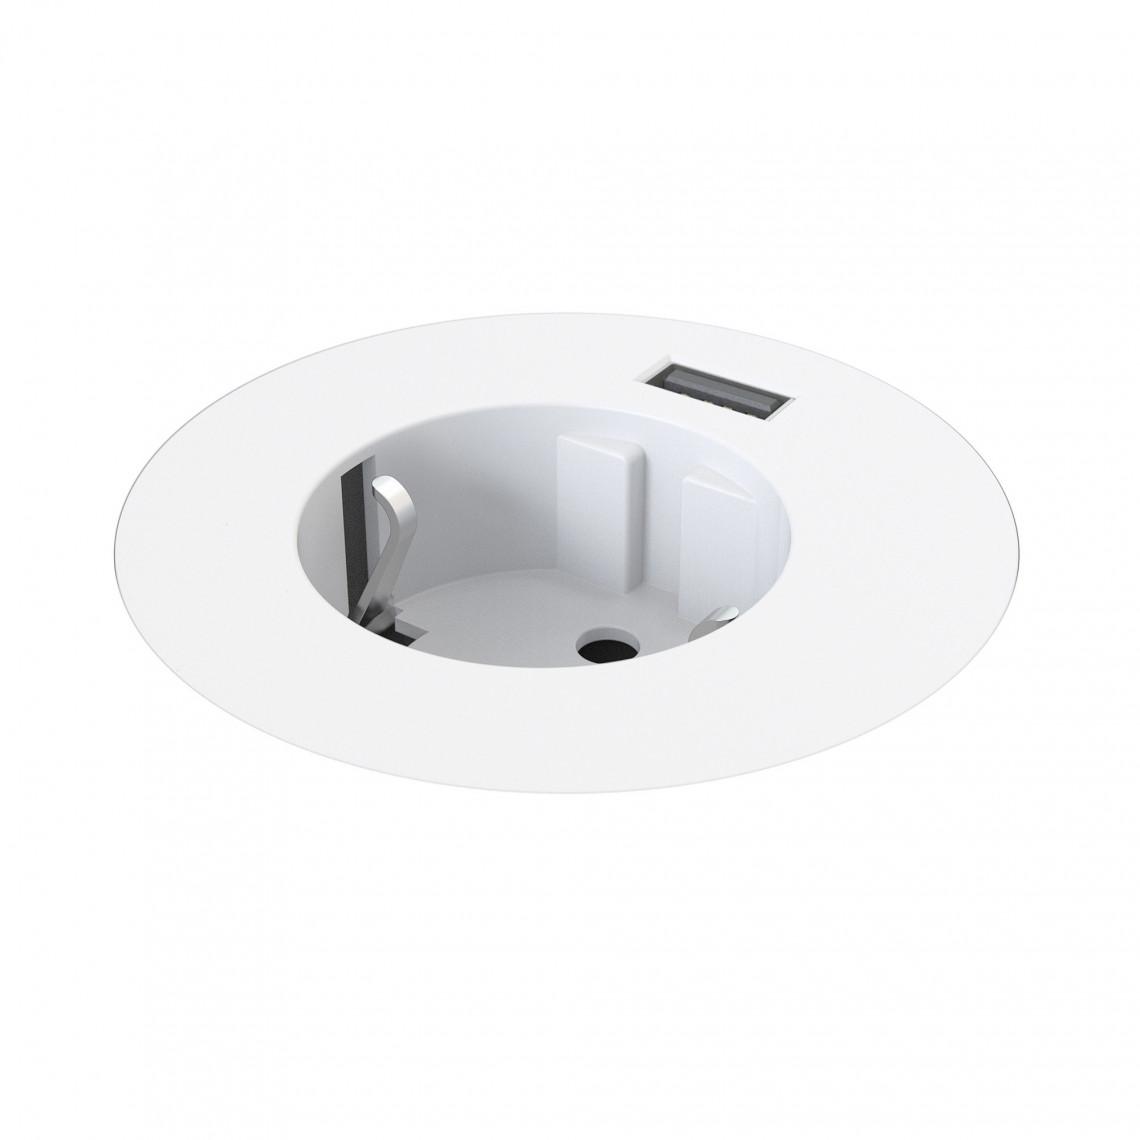 Powerdot MIDI - El, USB Laddare